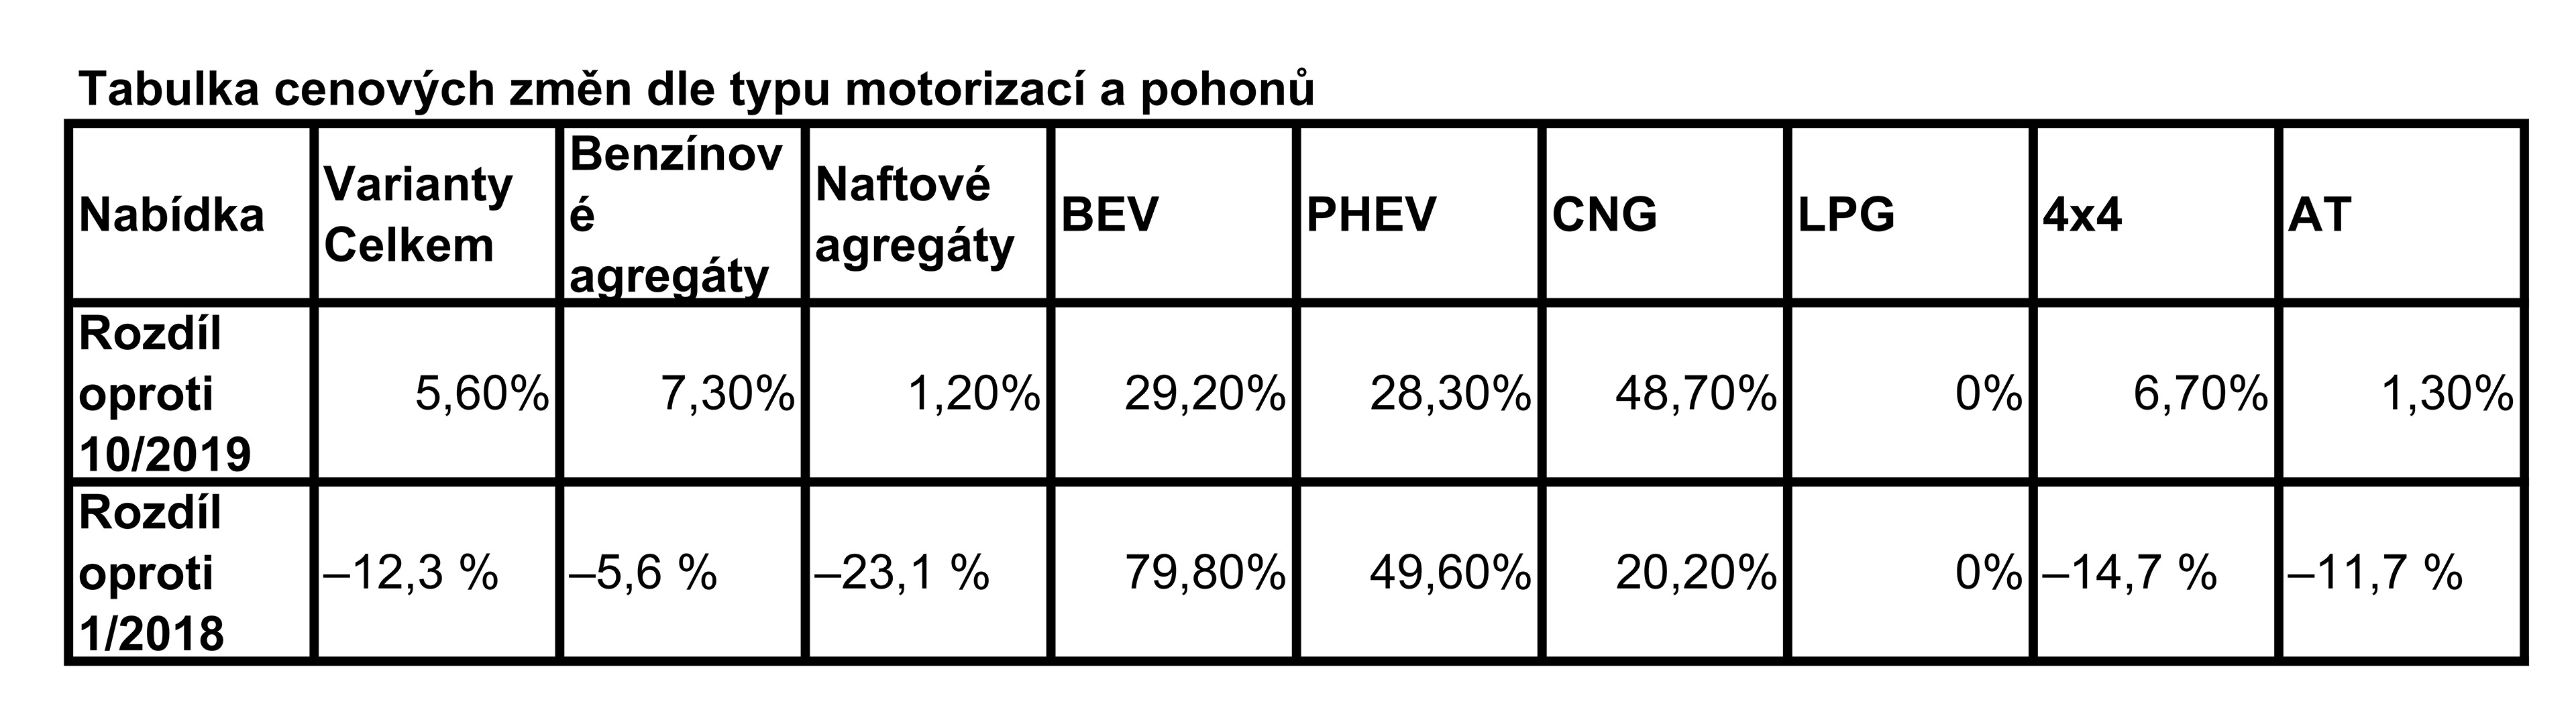 ey-tabulka-3-cenovy-index-ey-vice-nez-polovina-automobil-na-trhu-zdrazila